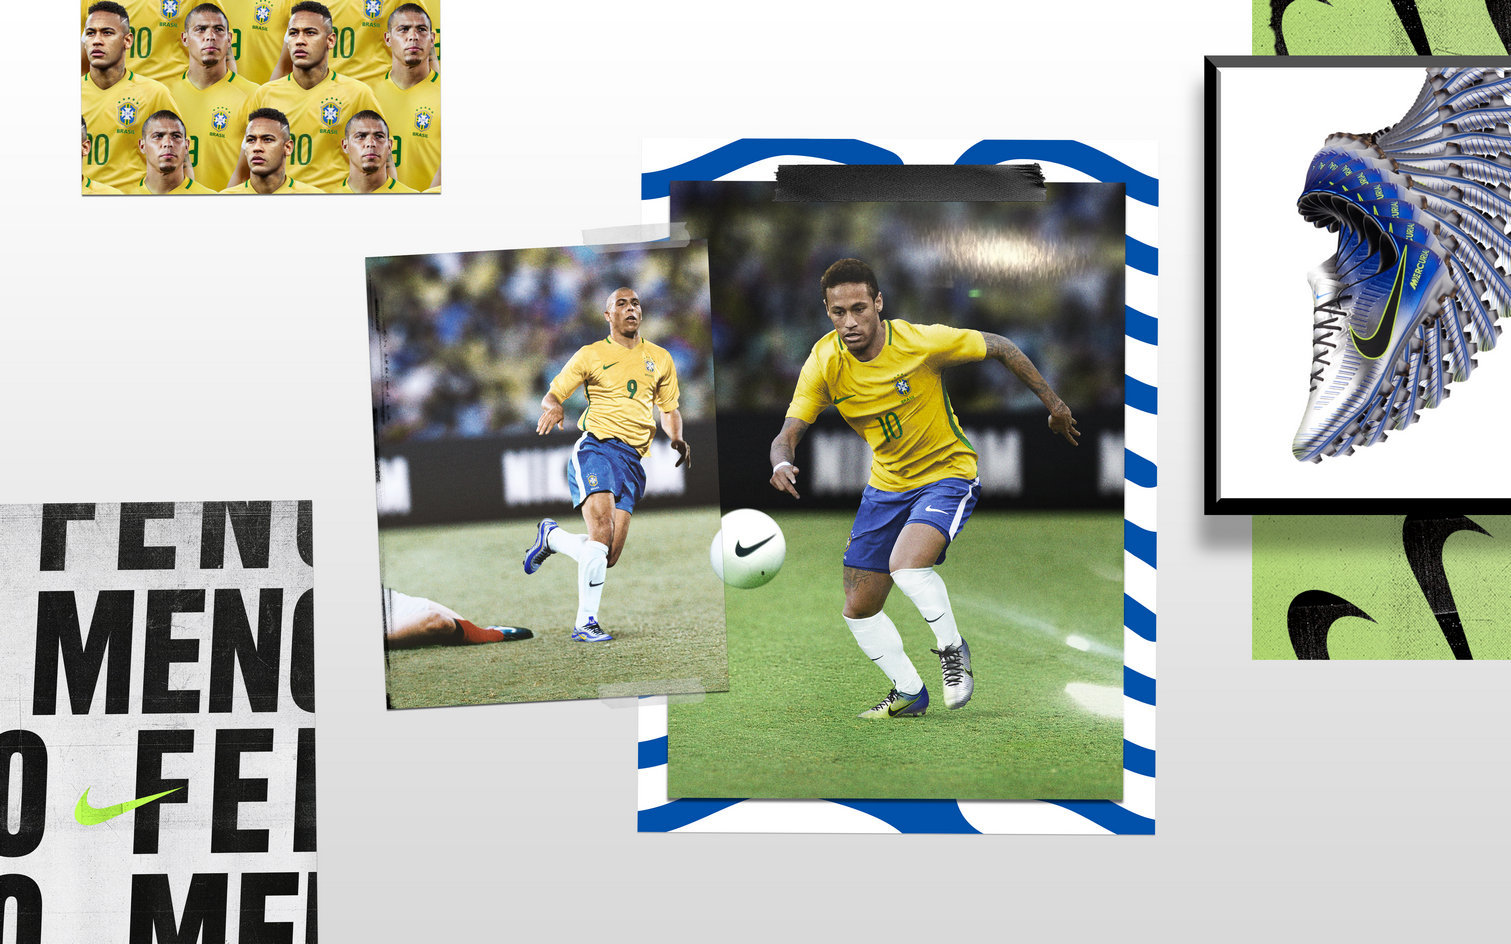 Botines Mercurial Puro Fenomeno de Neymar | Foto Nike